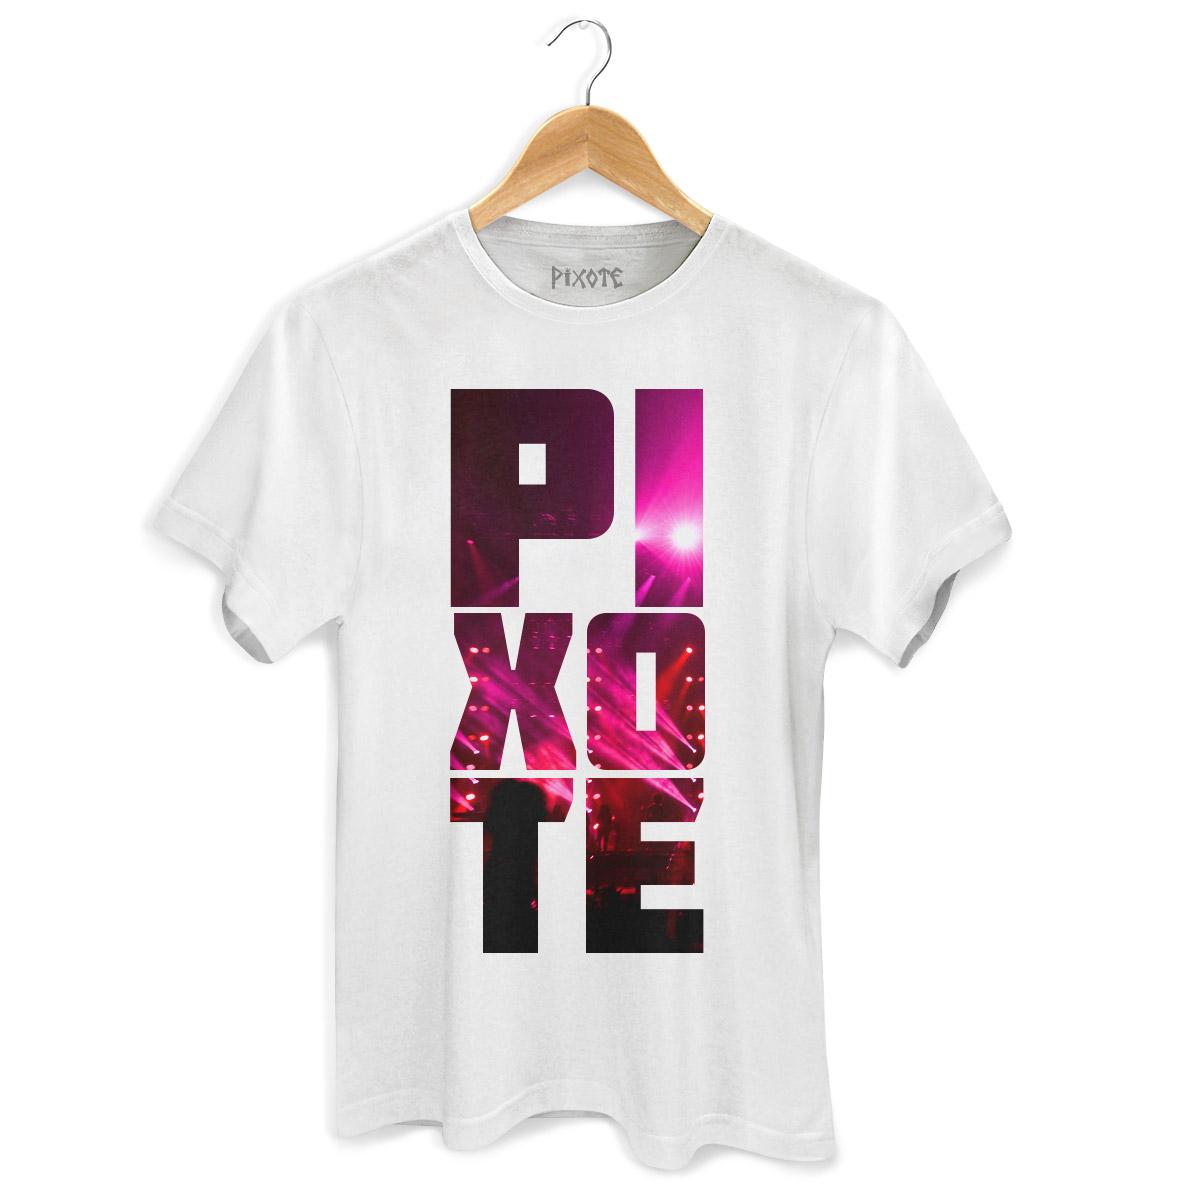 Camiseta Masculina Pixote Lights